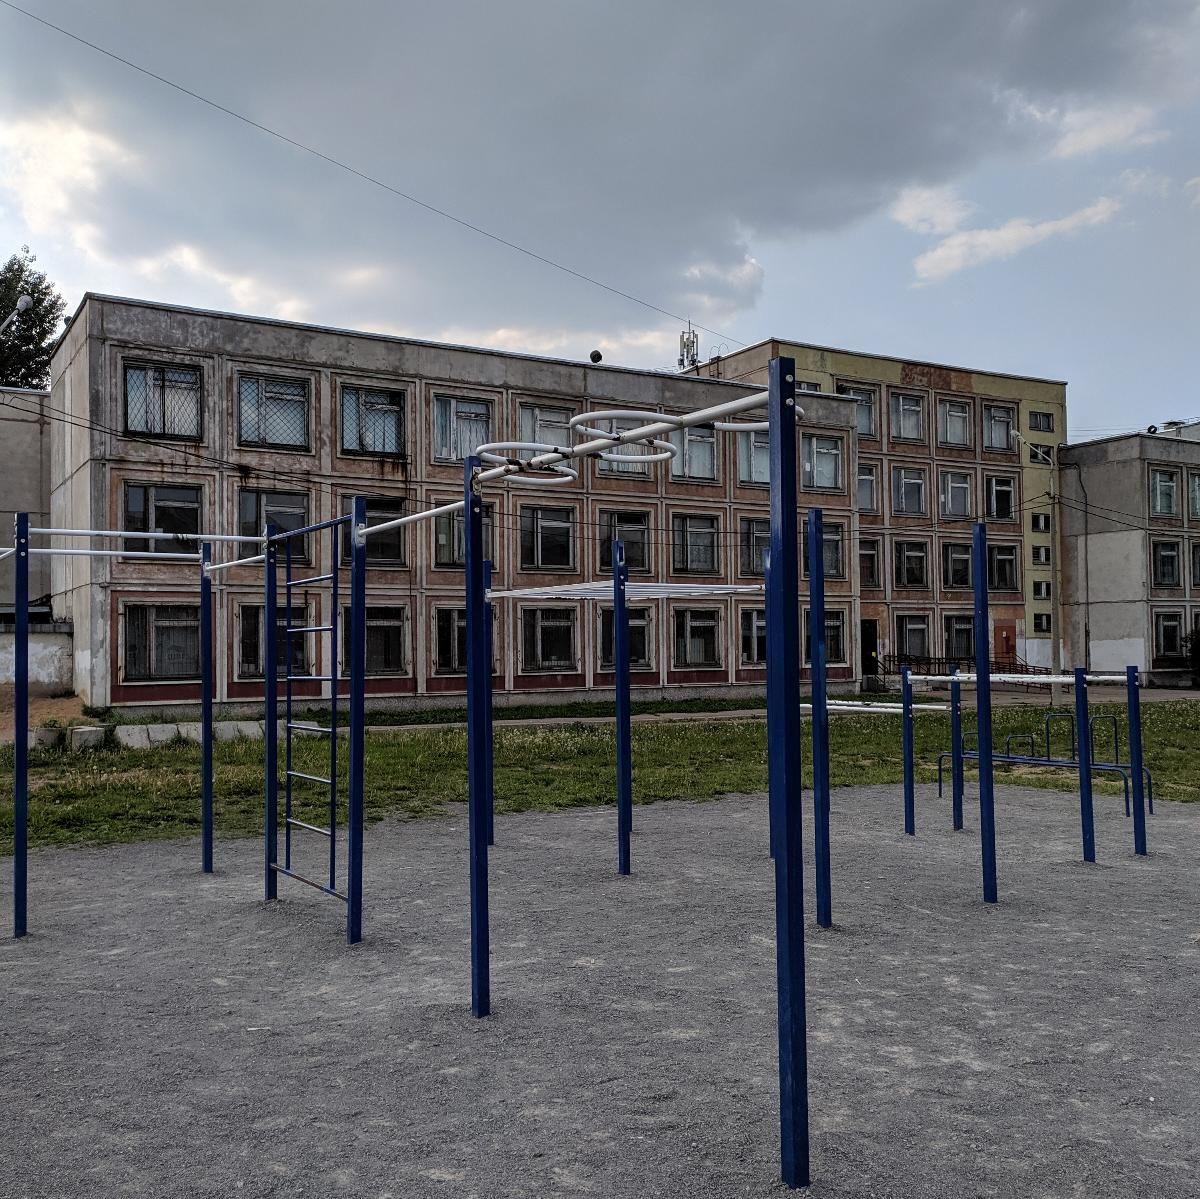 Cherepovets - Fitness Park - Почта России 162626